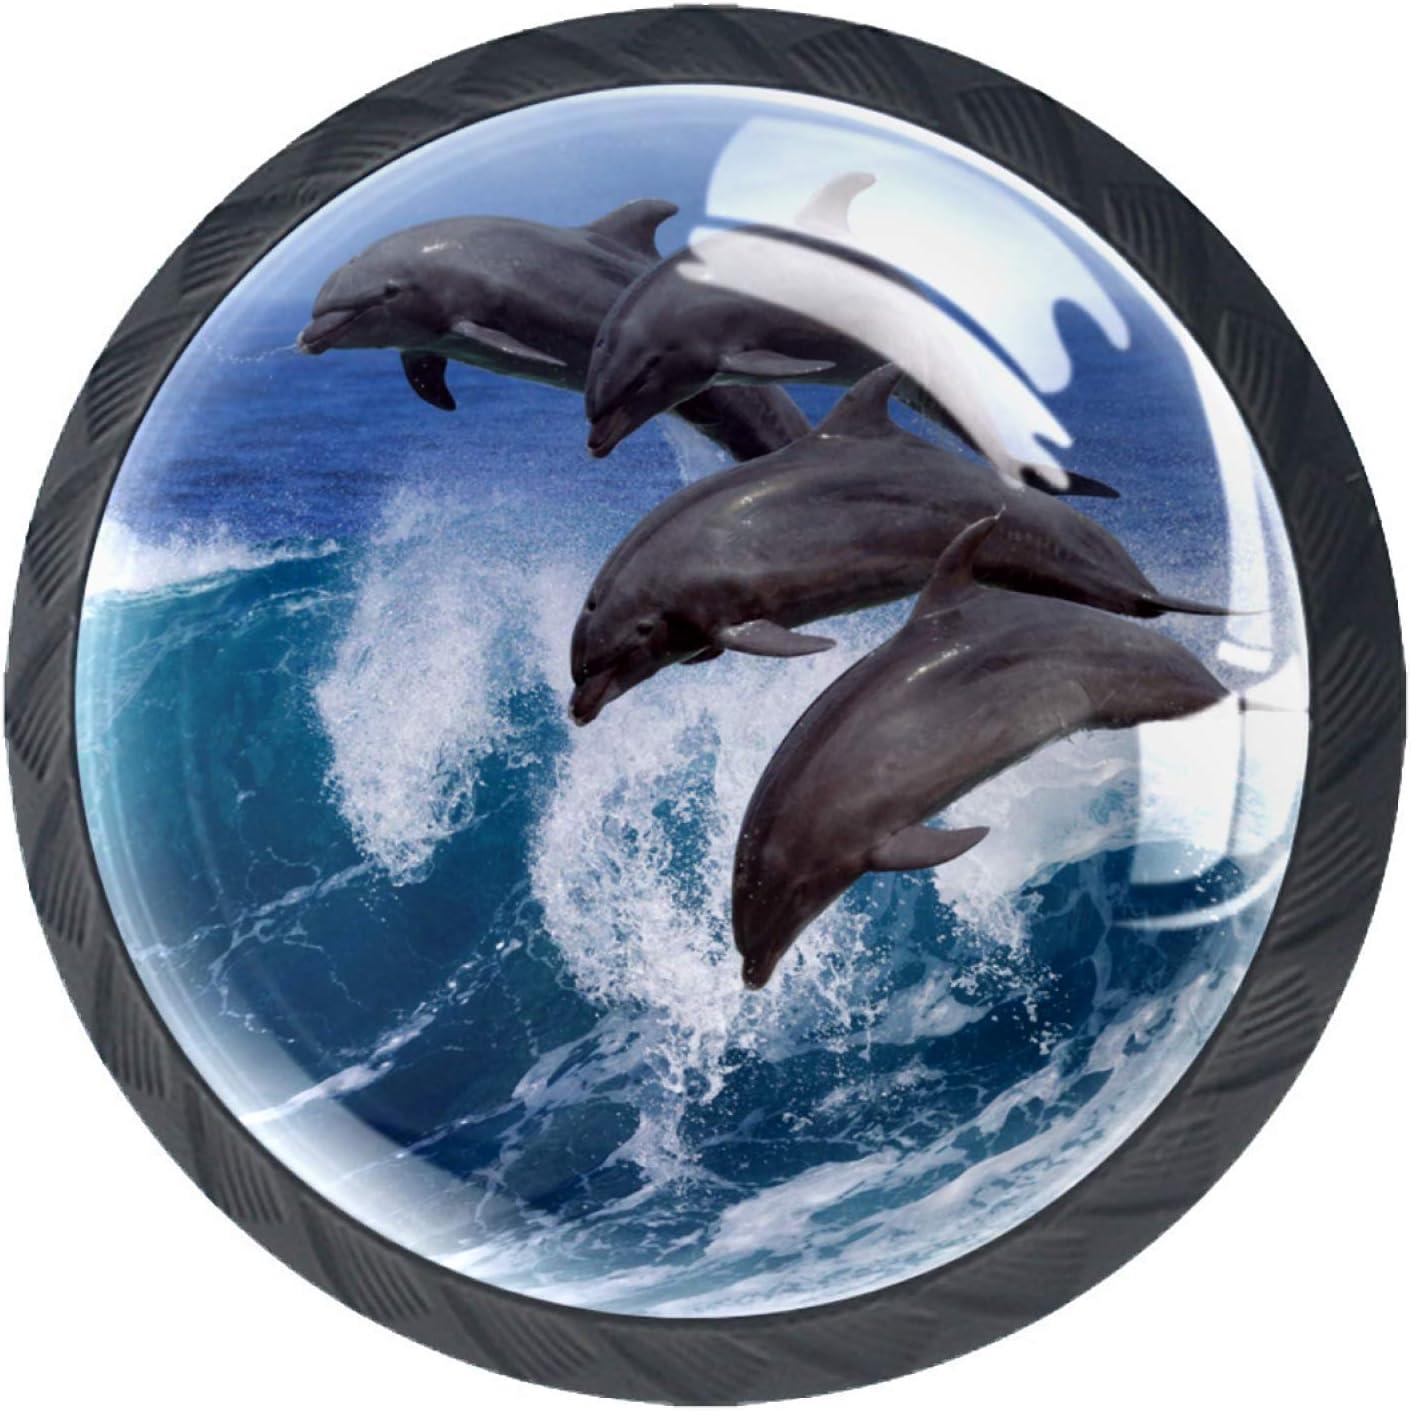 Door Knobs Ocean Dolphin Drawer Knobs Lovely Handle Pull Cupboar